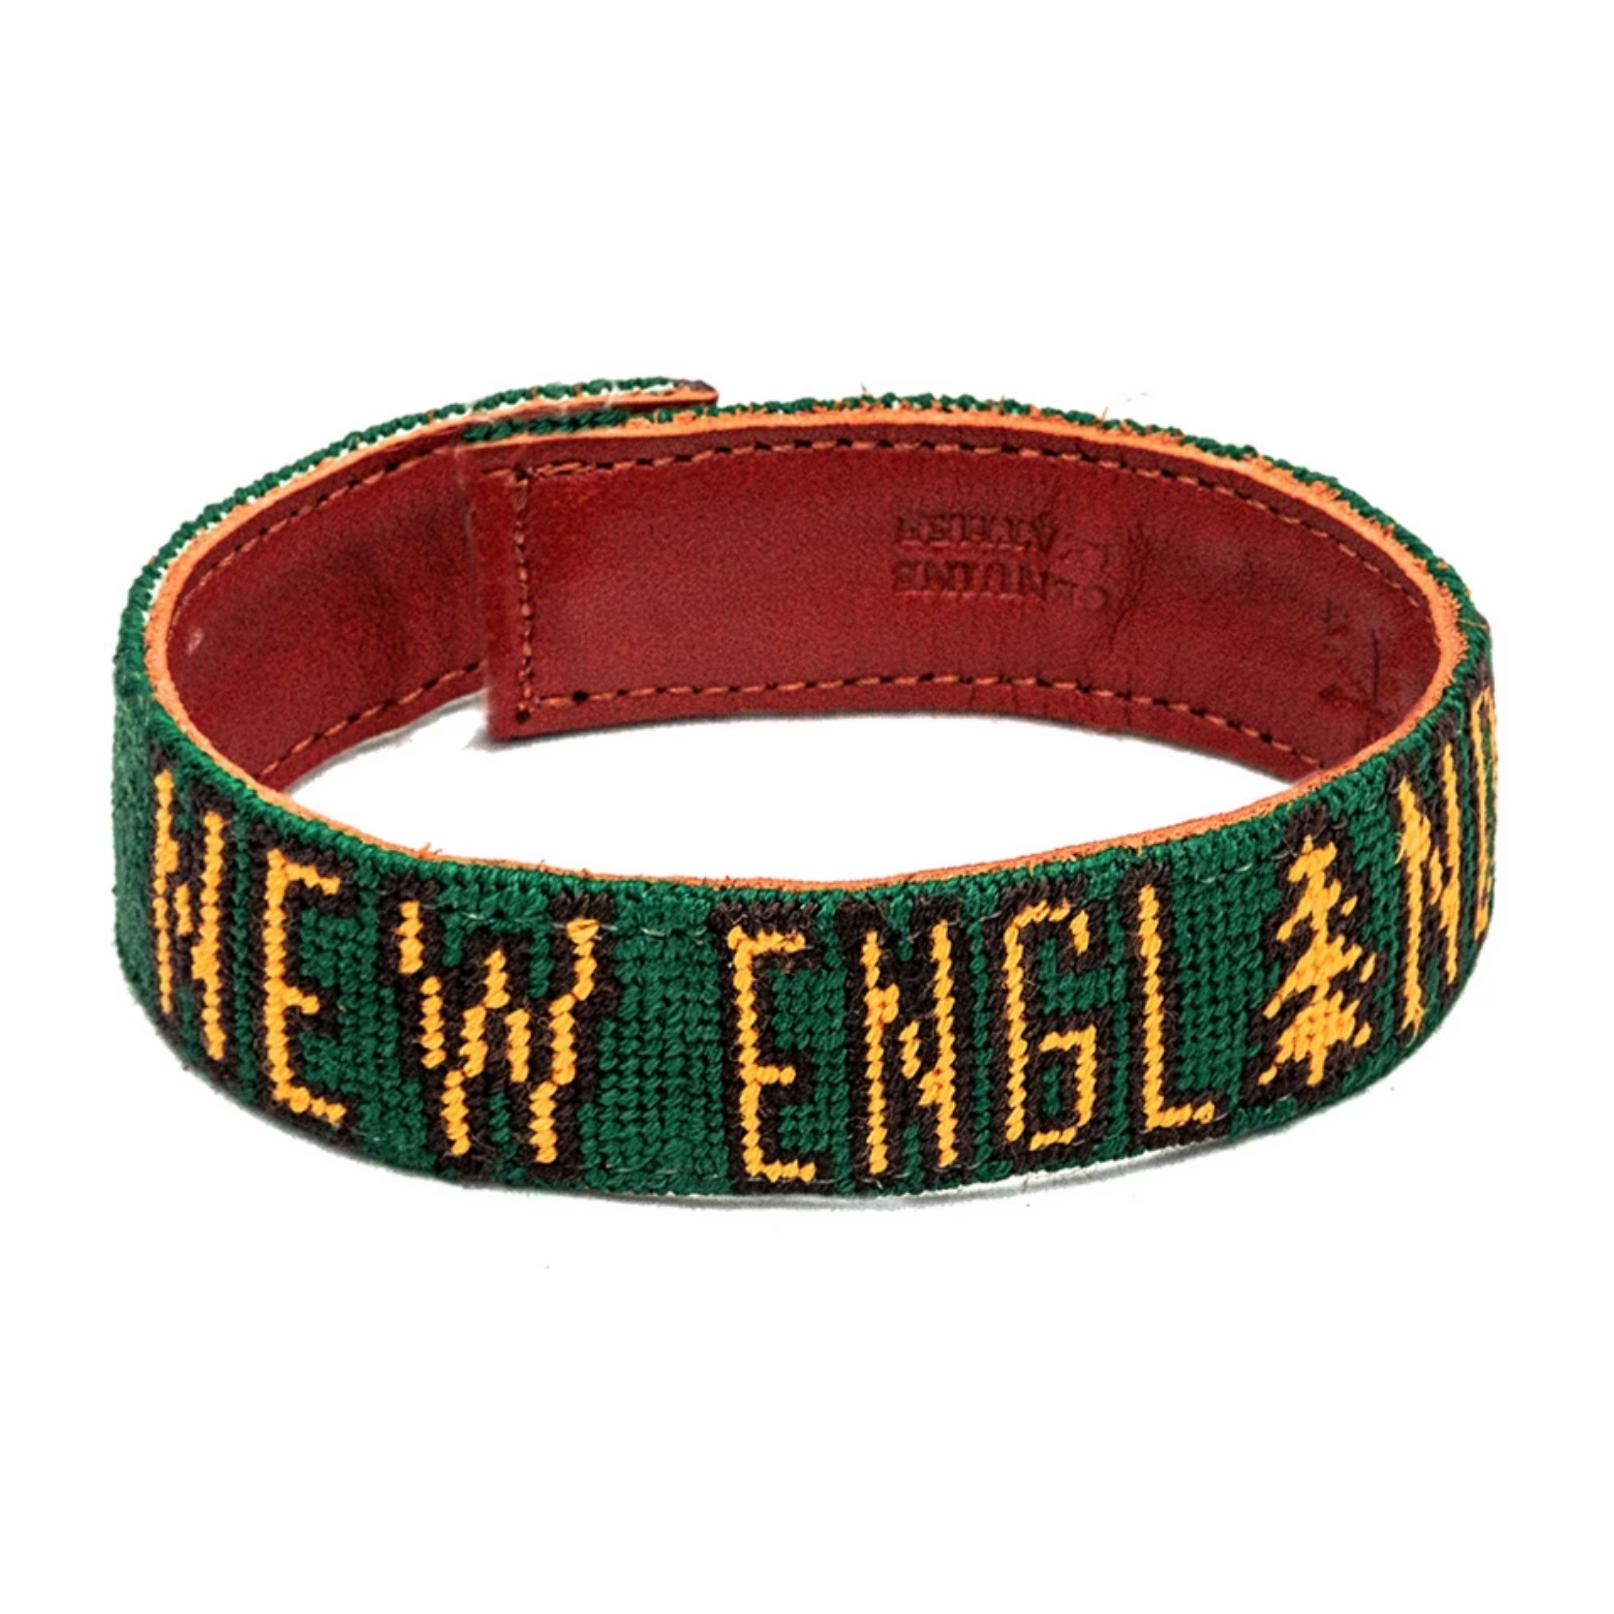 Kiel James Patrick Kiel James Patrick Slap Bracelet - New England